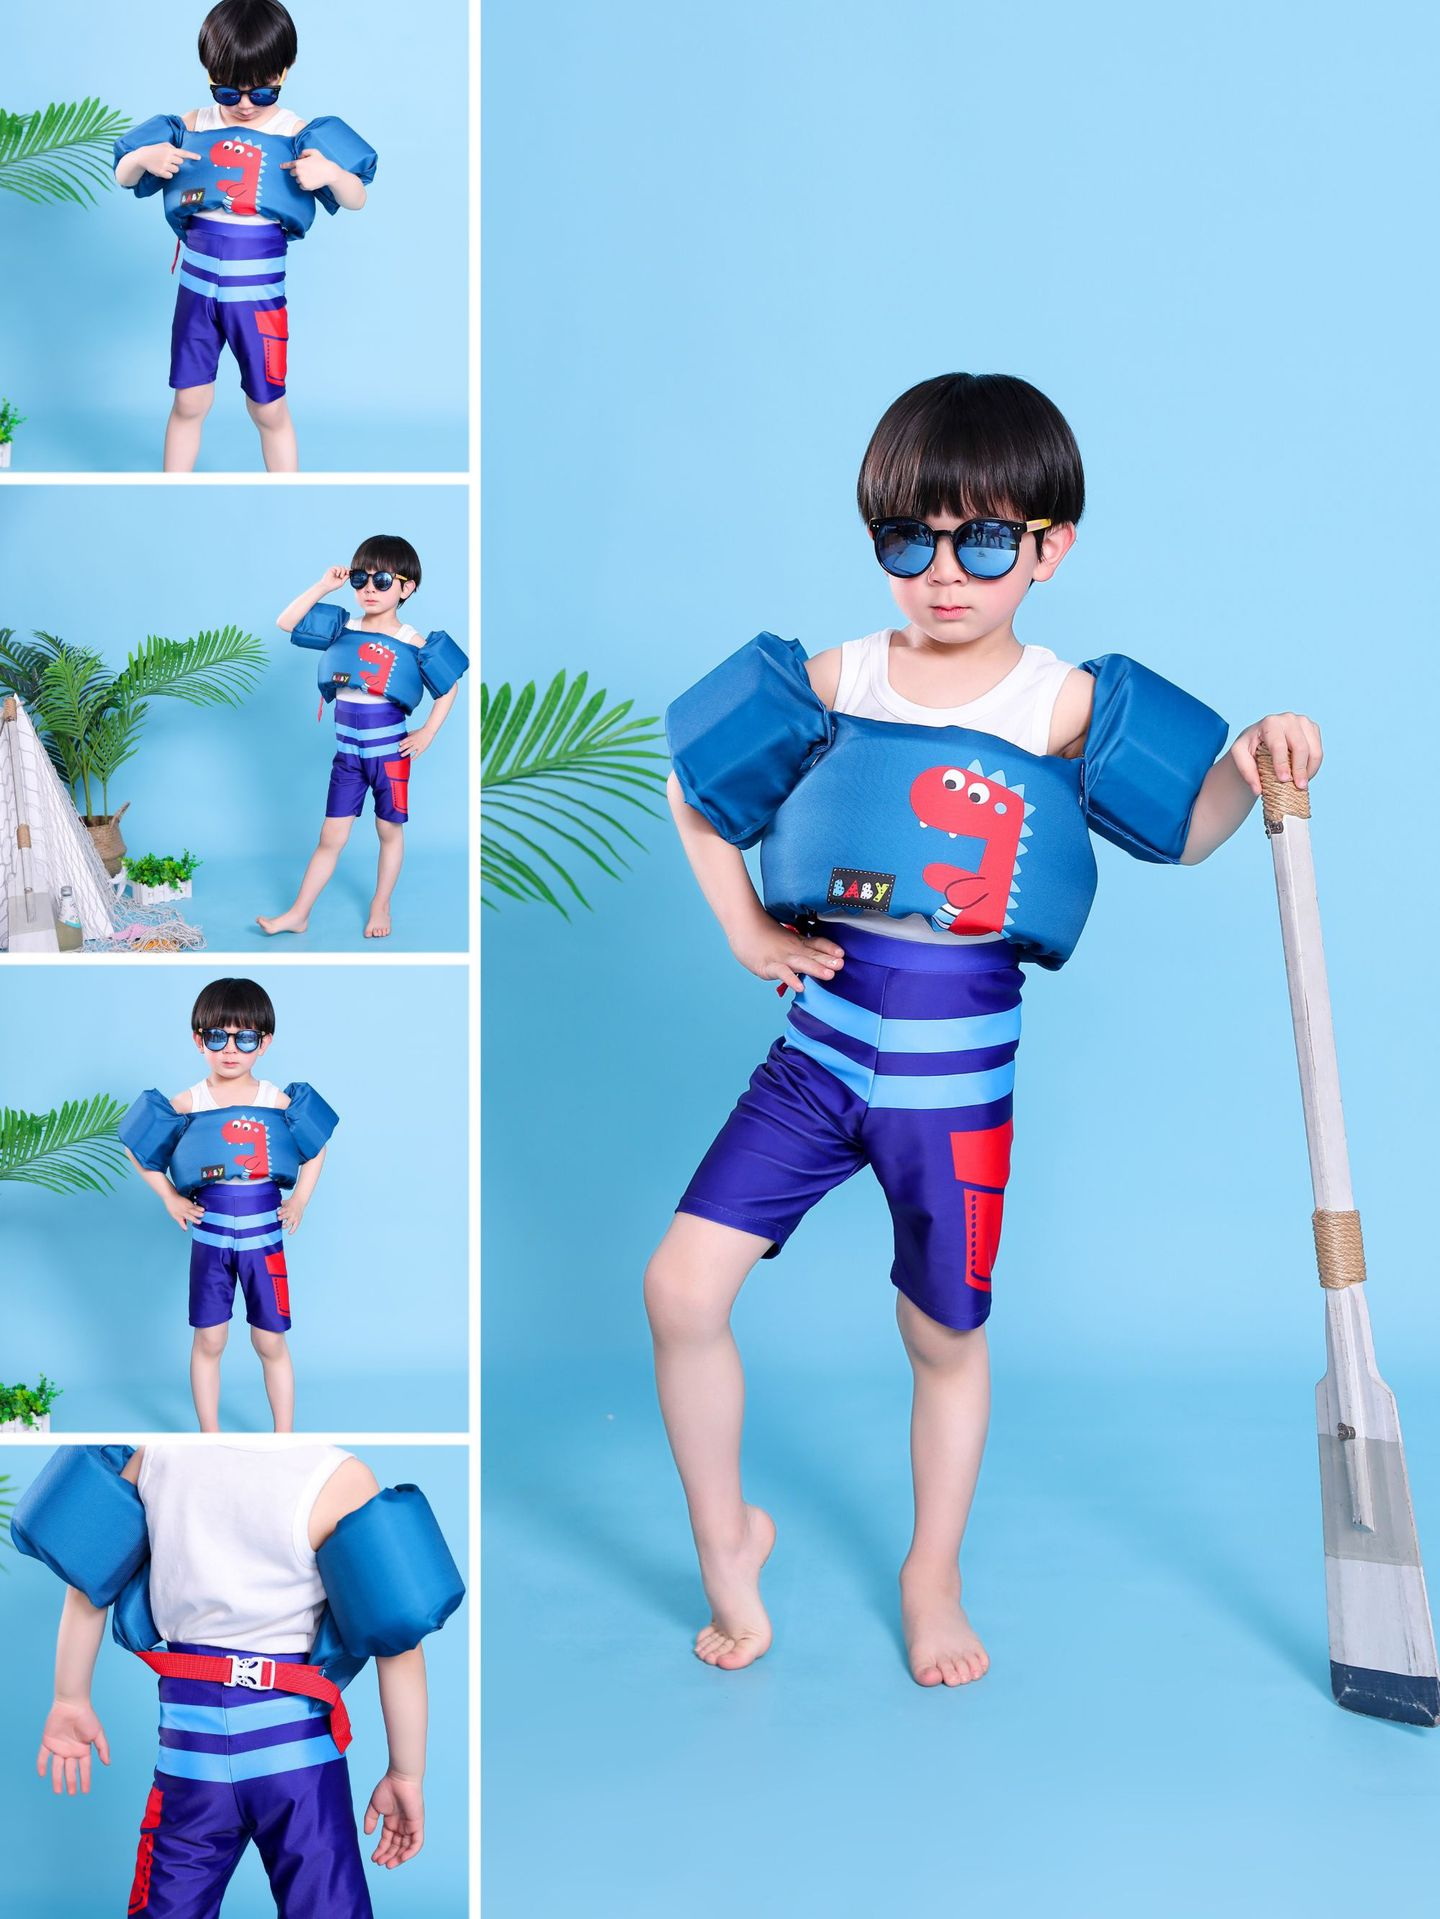 Children s life jacket buoyancy vest baby floating suit swimming arm foam lifebuoy sleeve WW190417117922